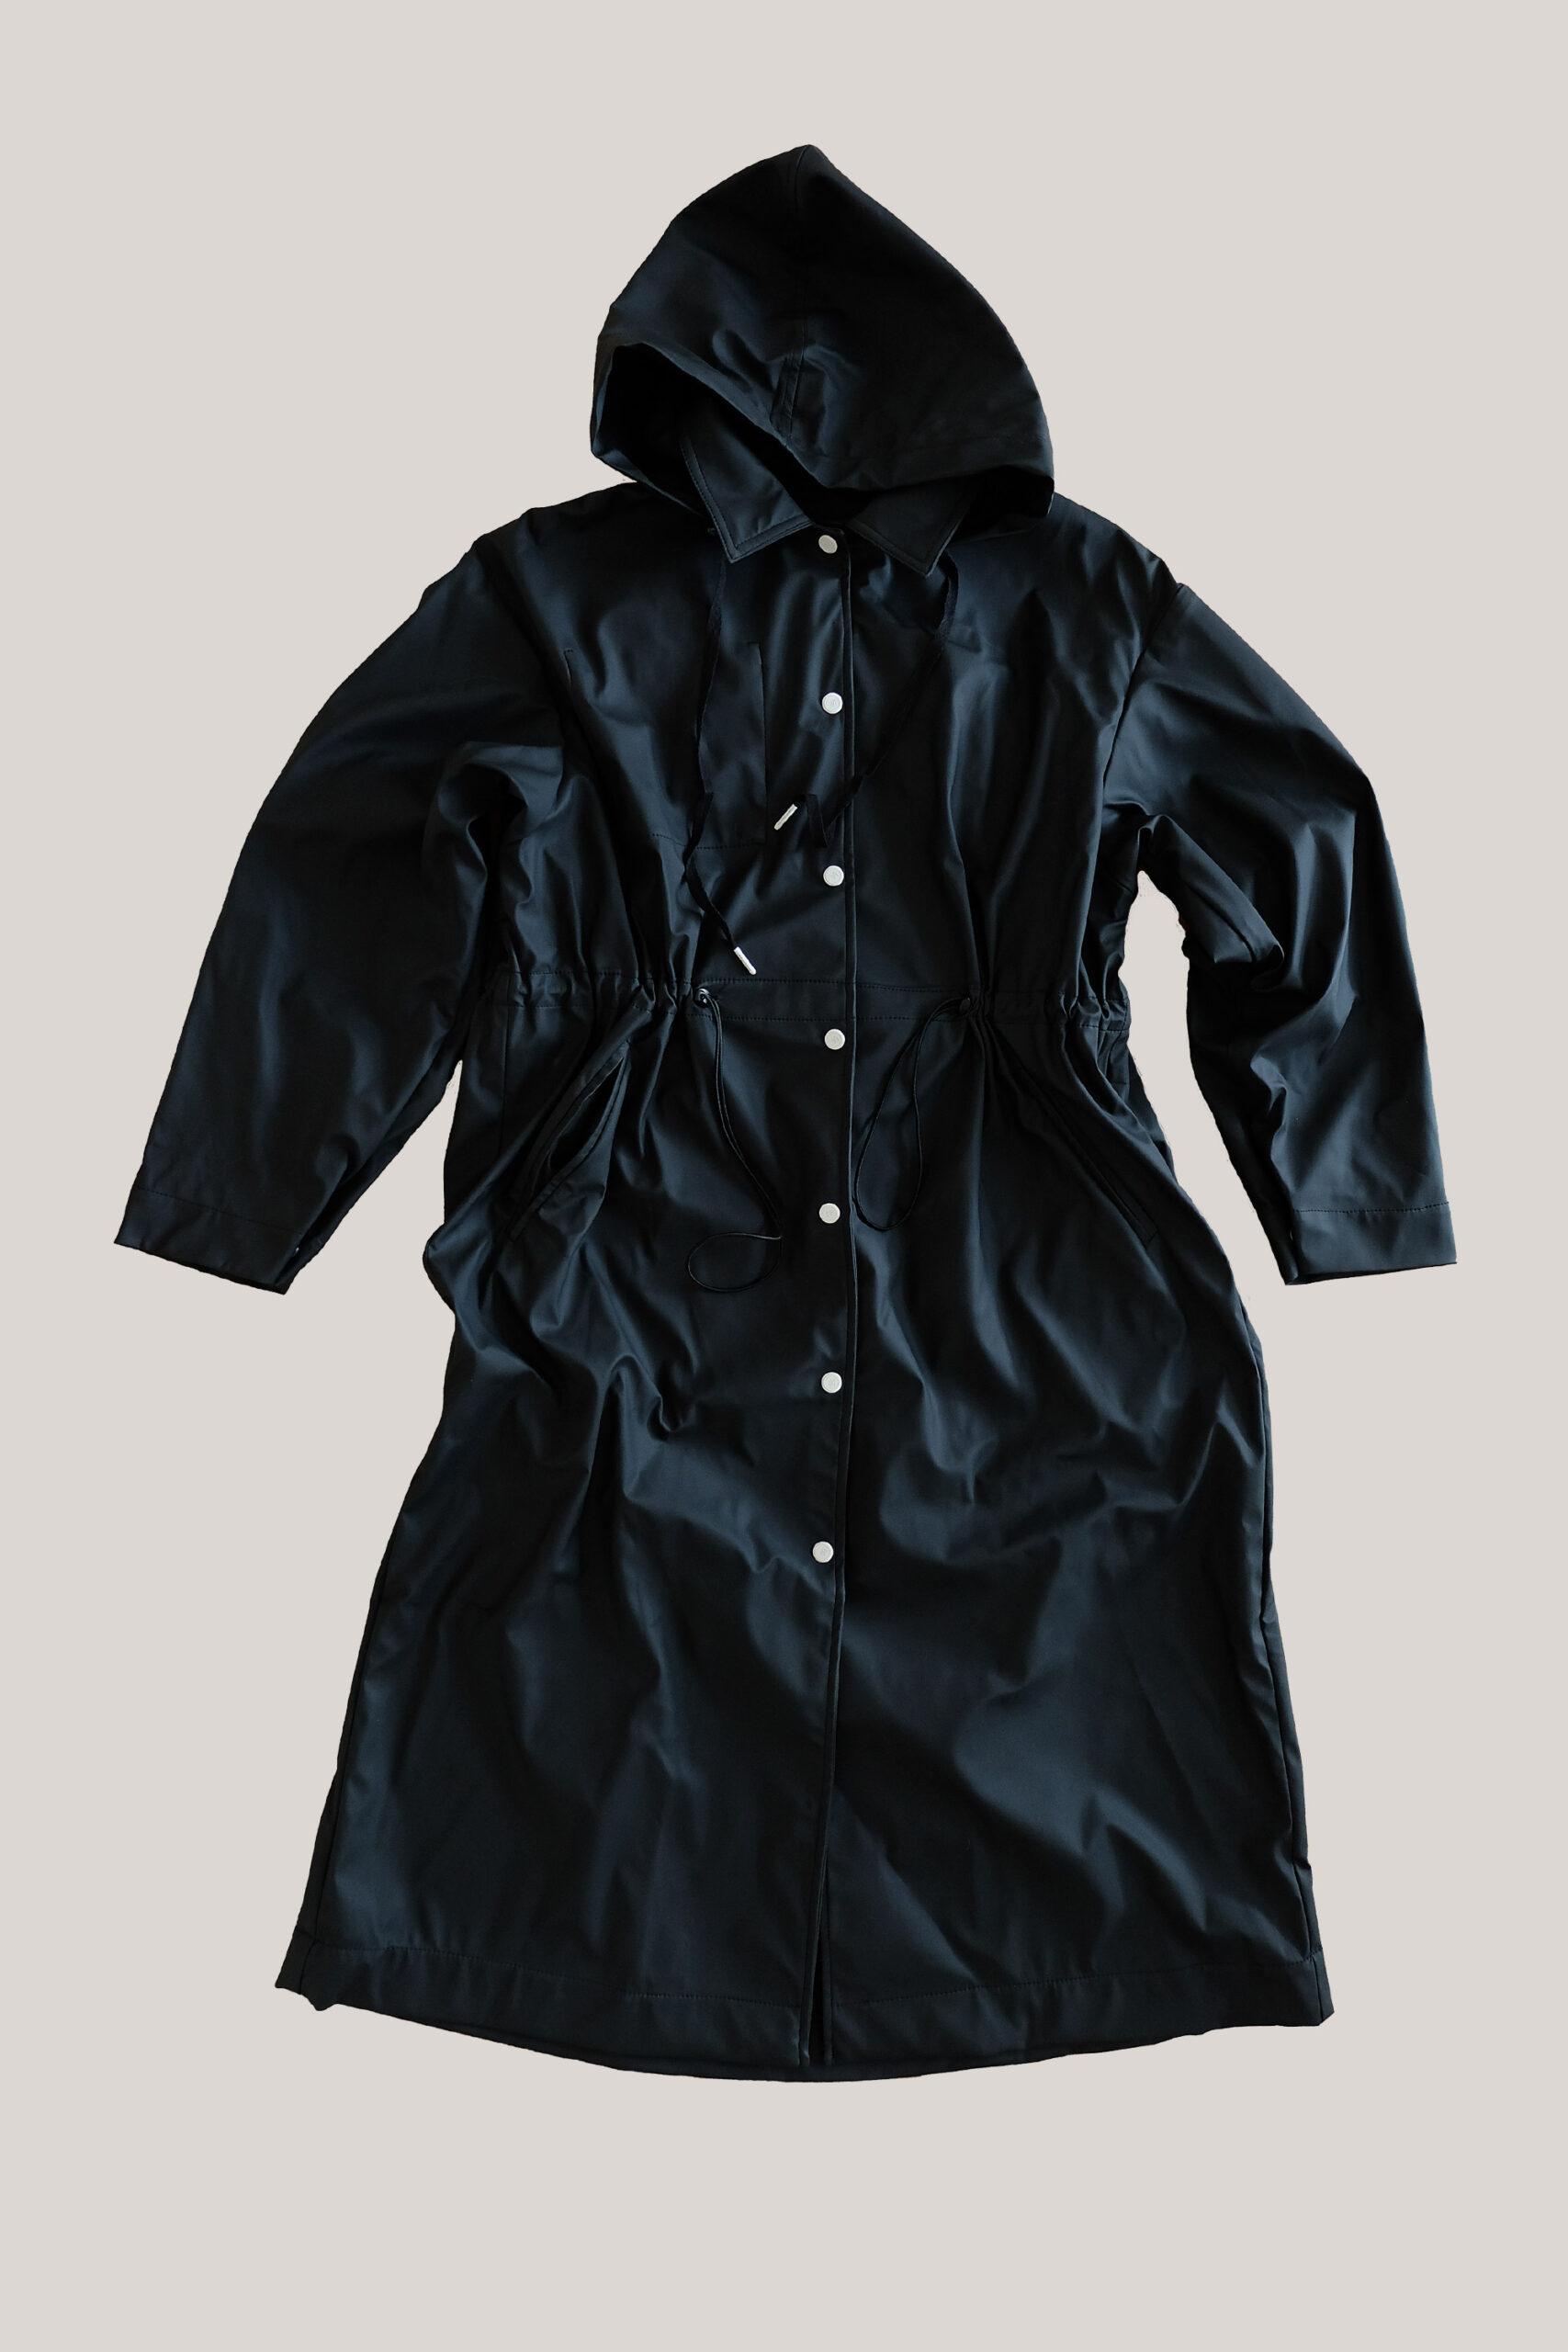 Hooded-Coat-1